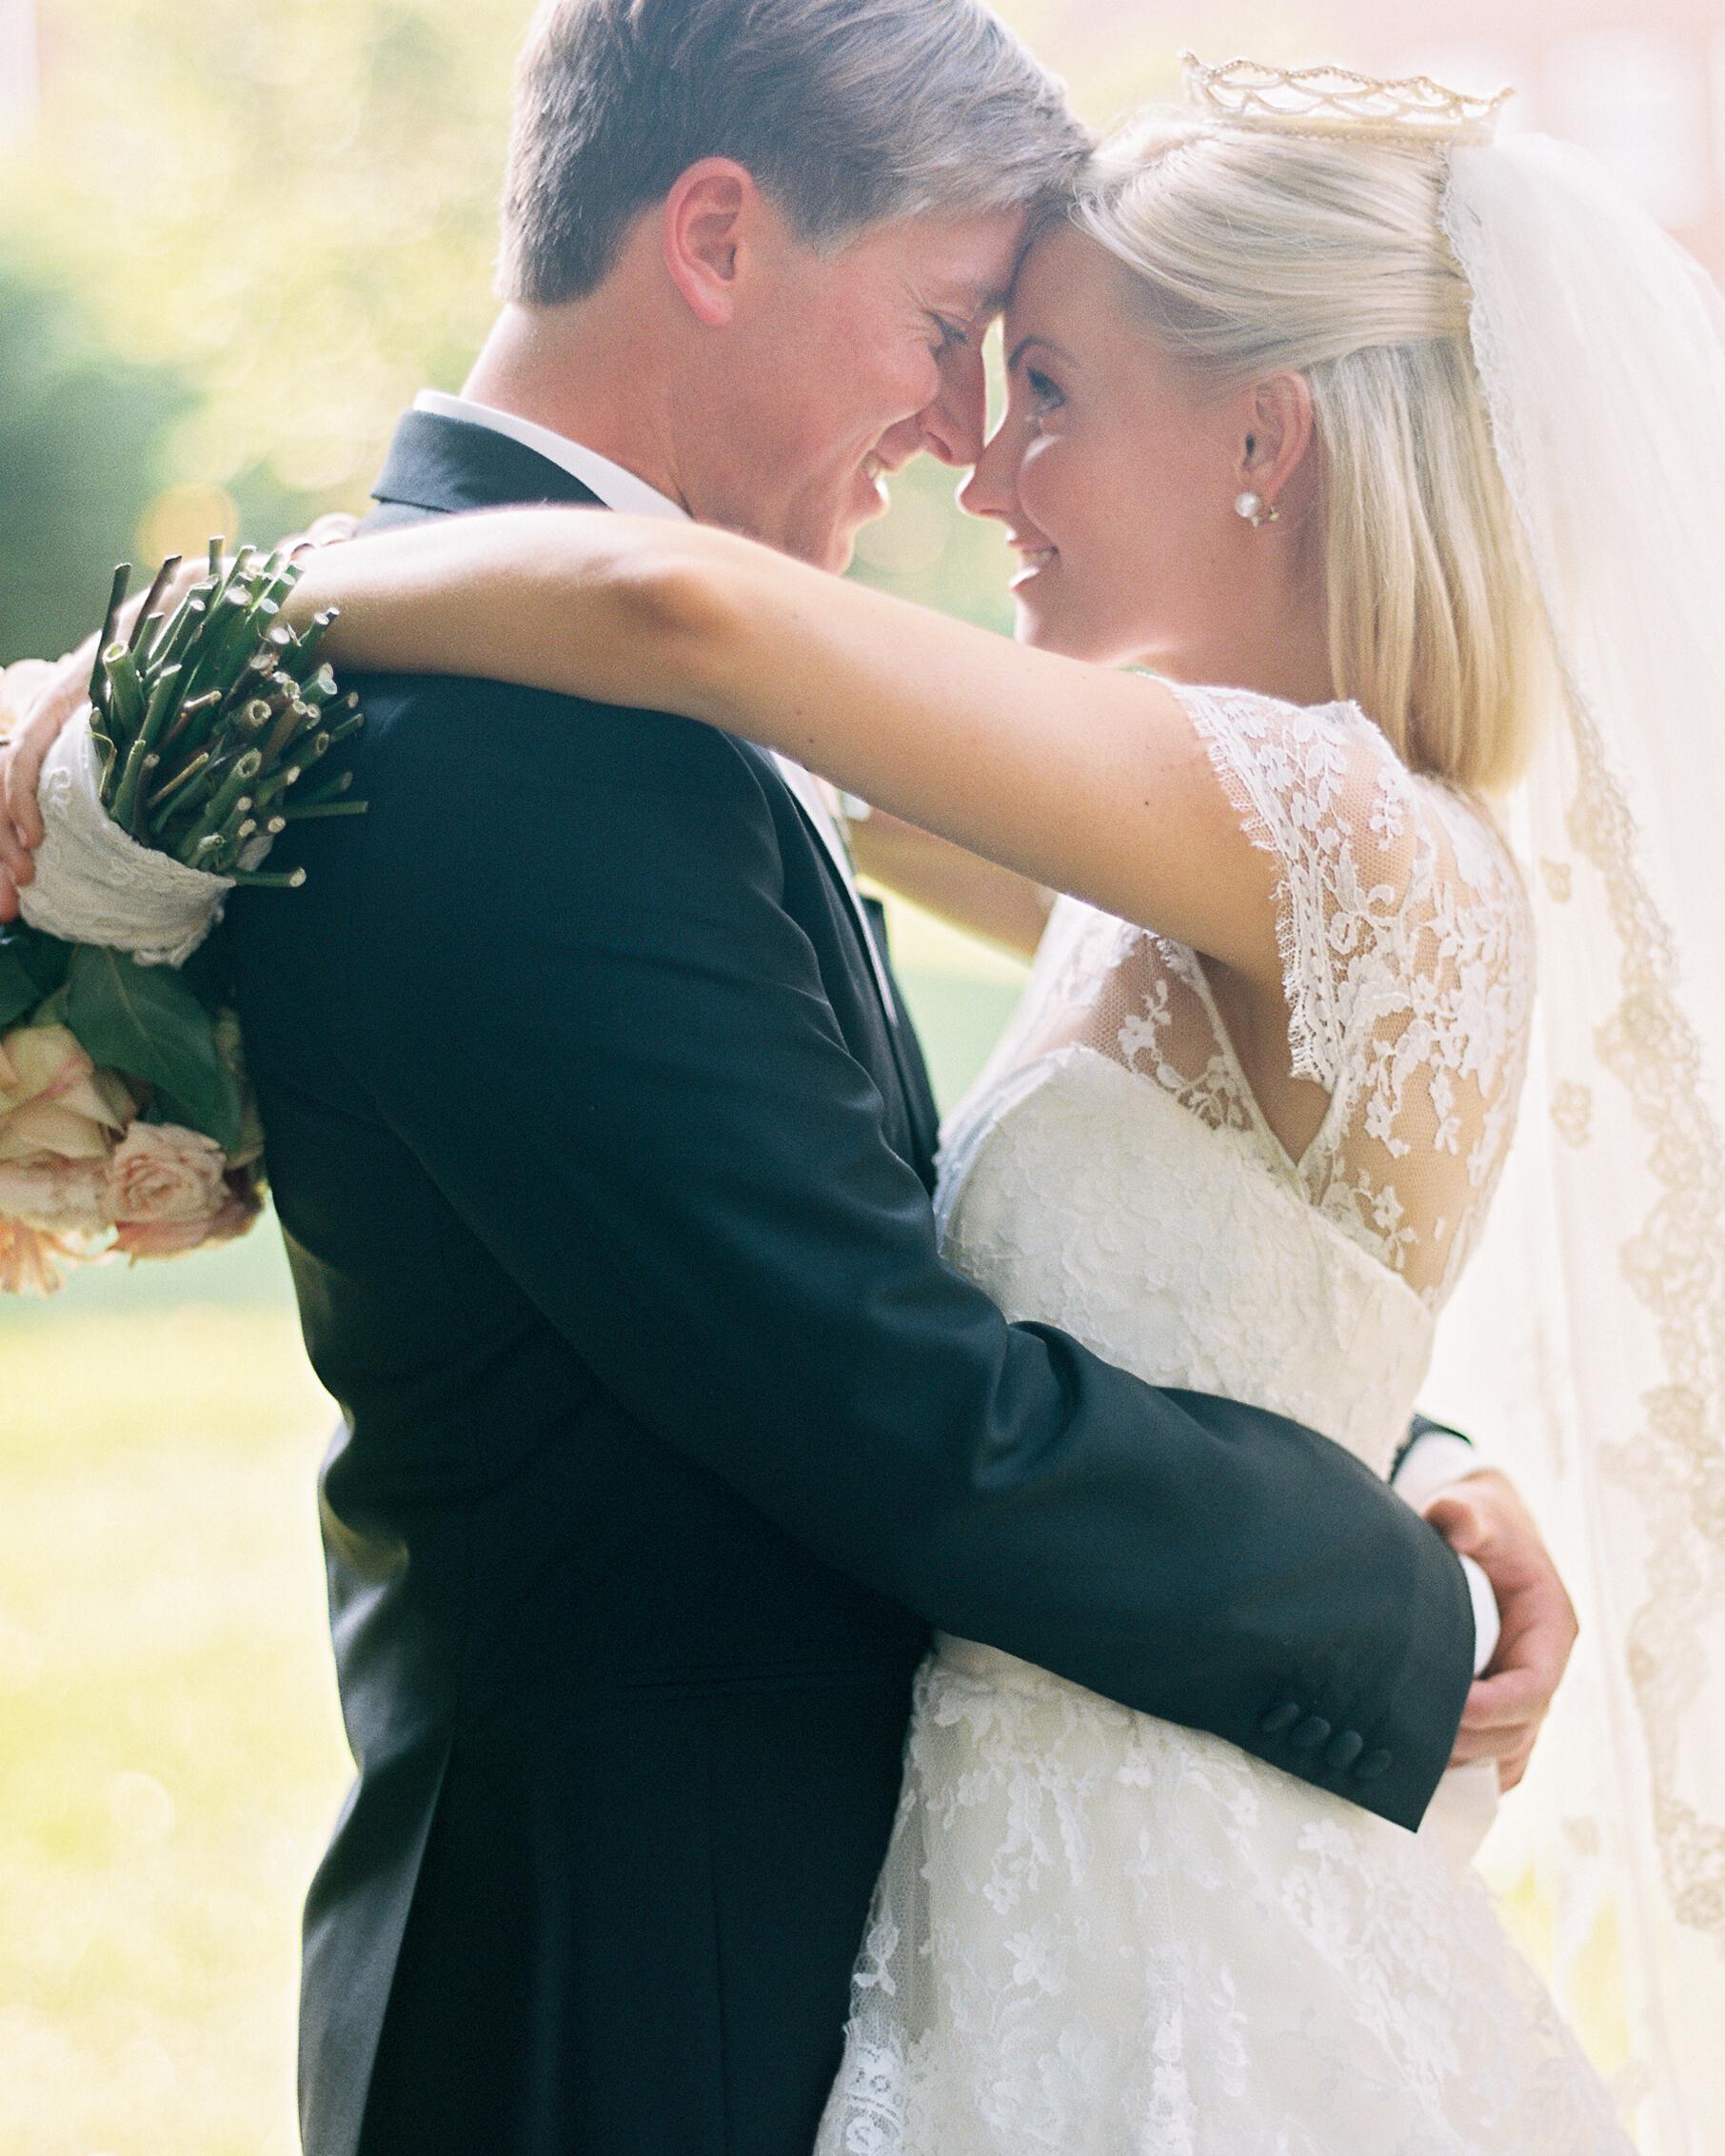 molly-patrick-wedding-couple-3261-s111760-0115.jpg